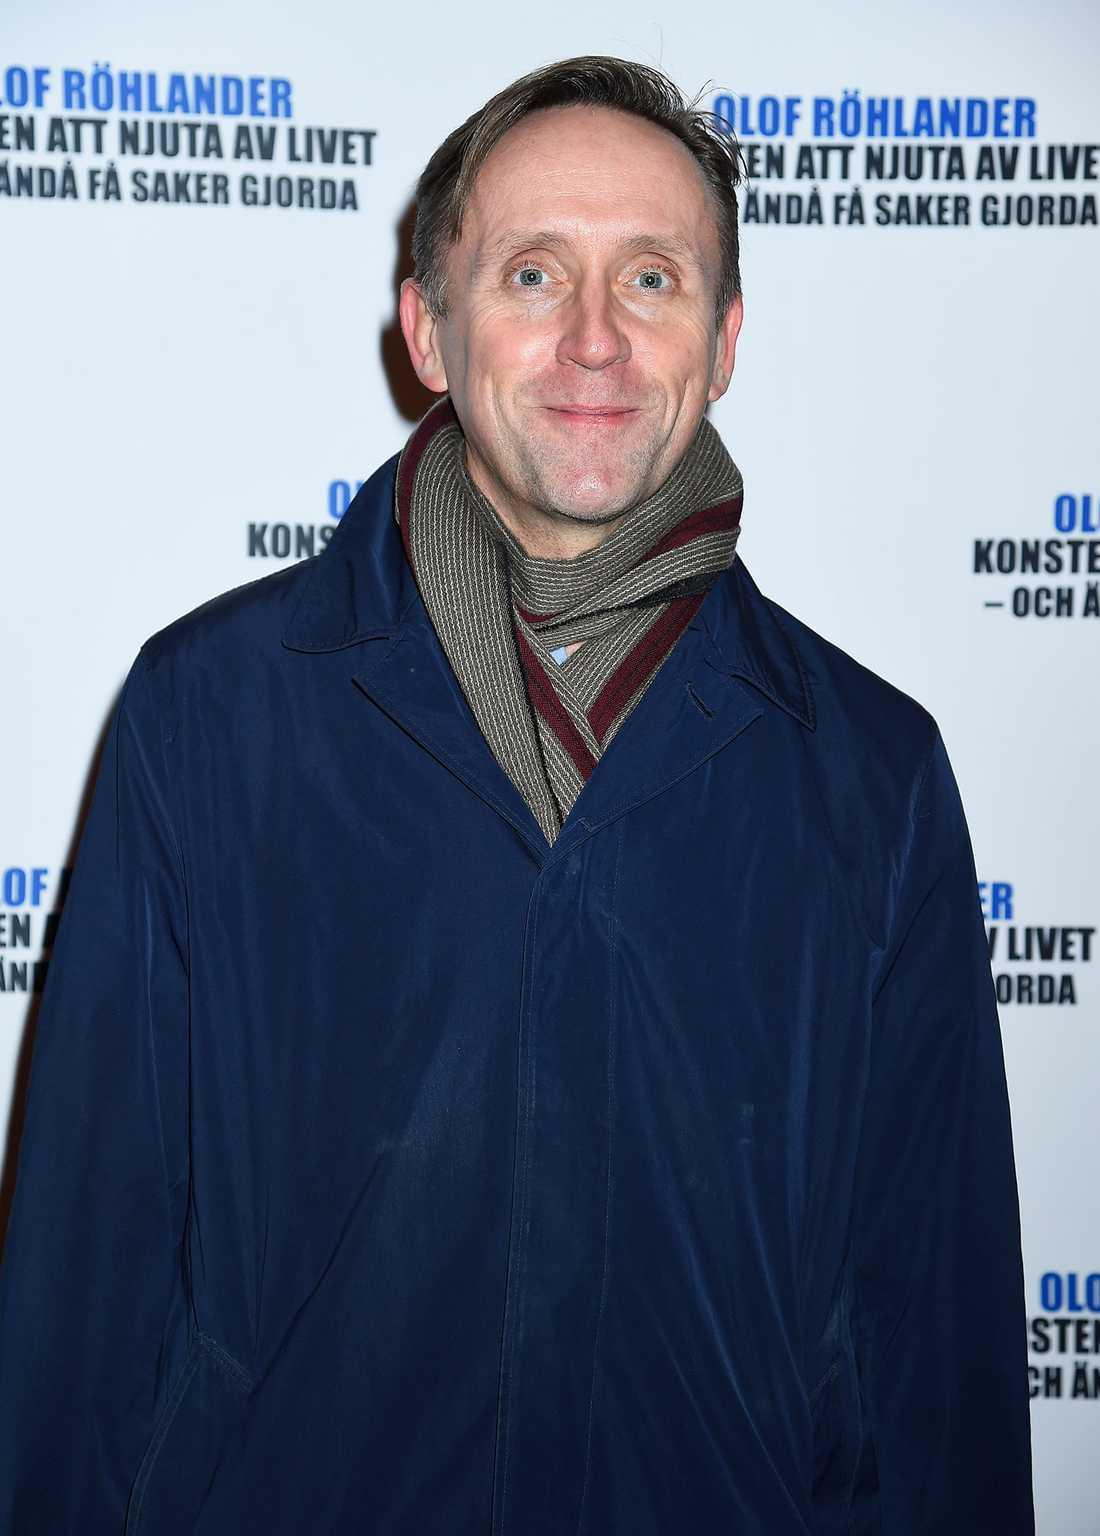 Göran Everdahl.